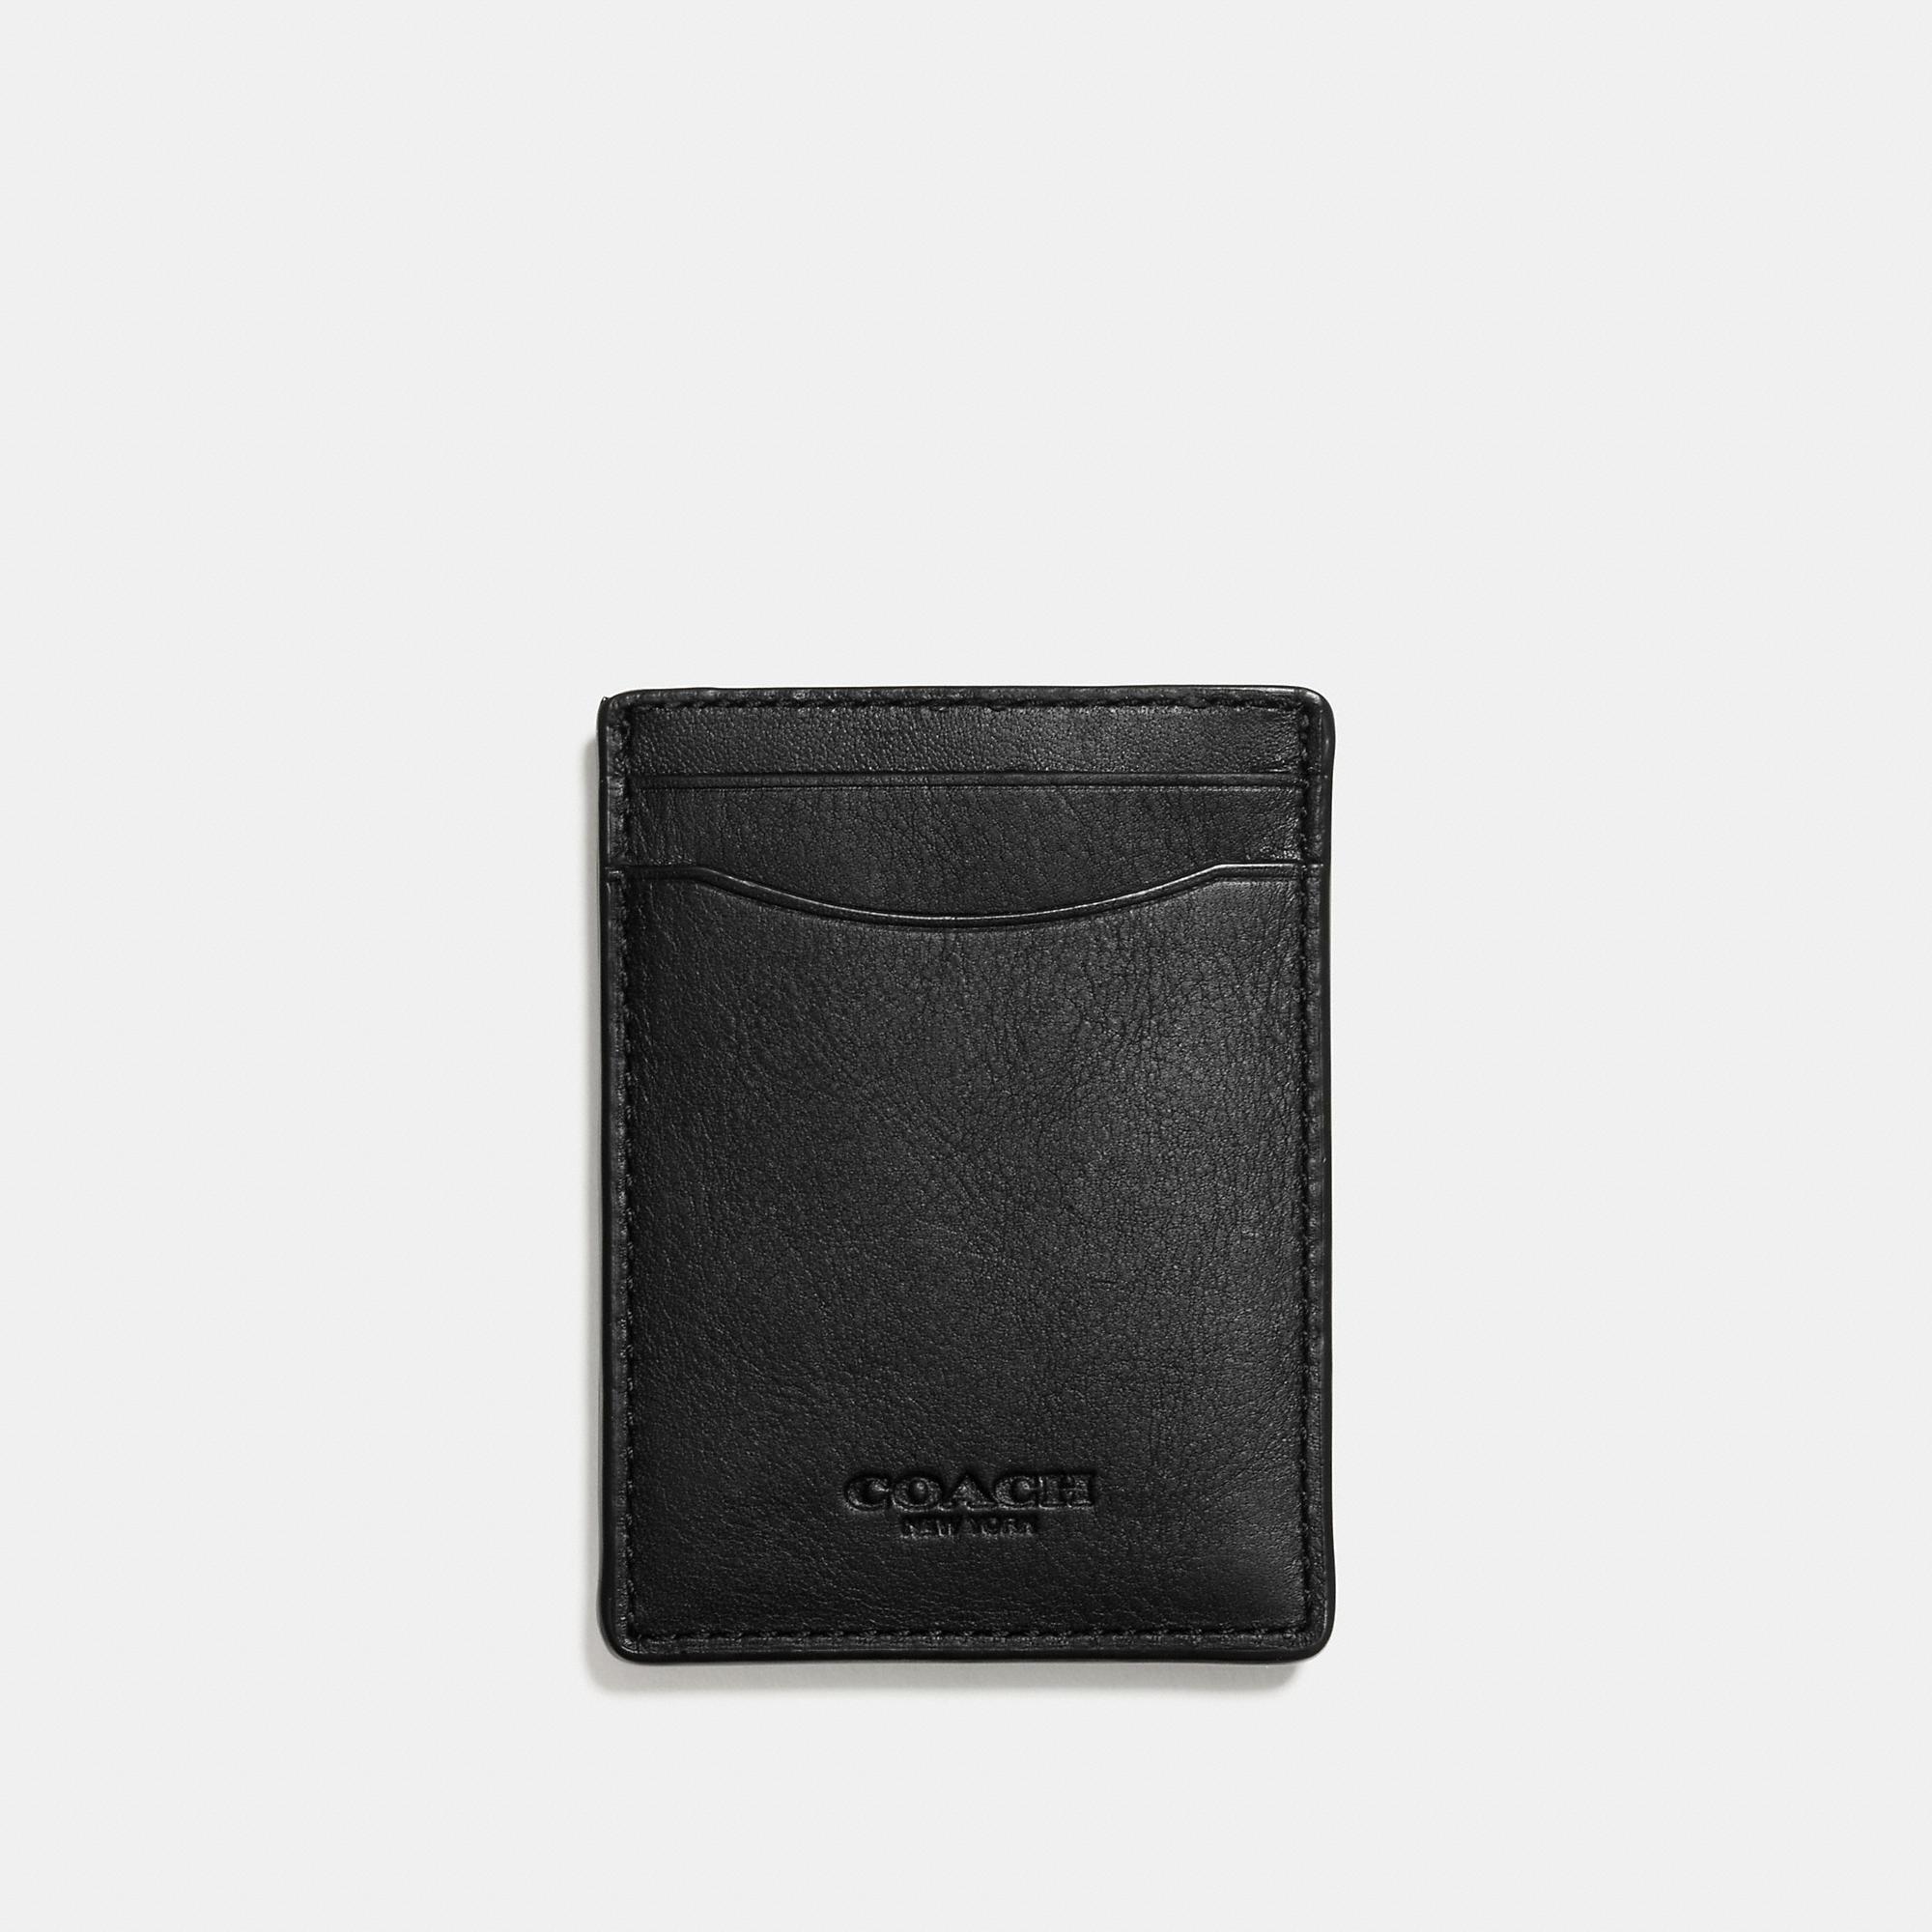 aef1c15cd0809 Lyst - COACH 3-in-1 Card Case In Sport Calf Leather in Black for Men